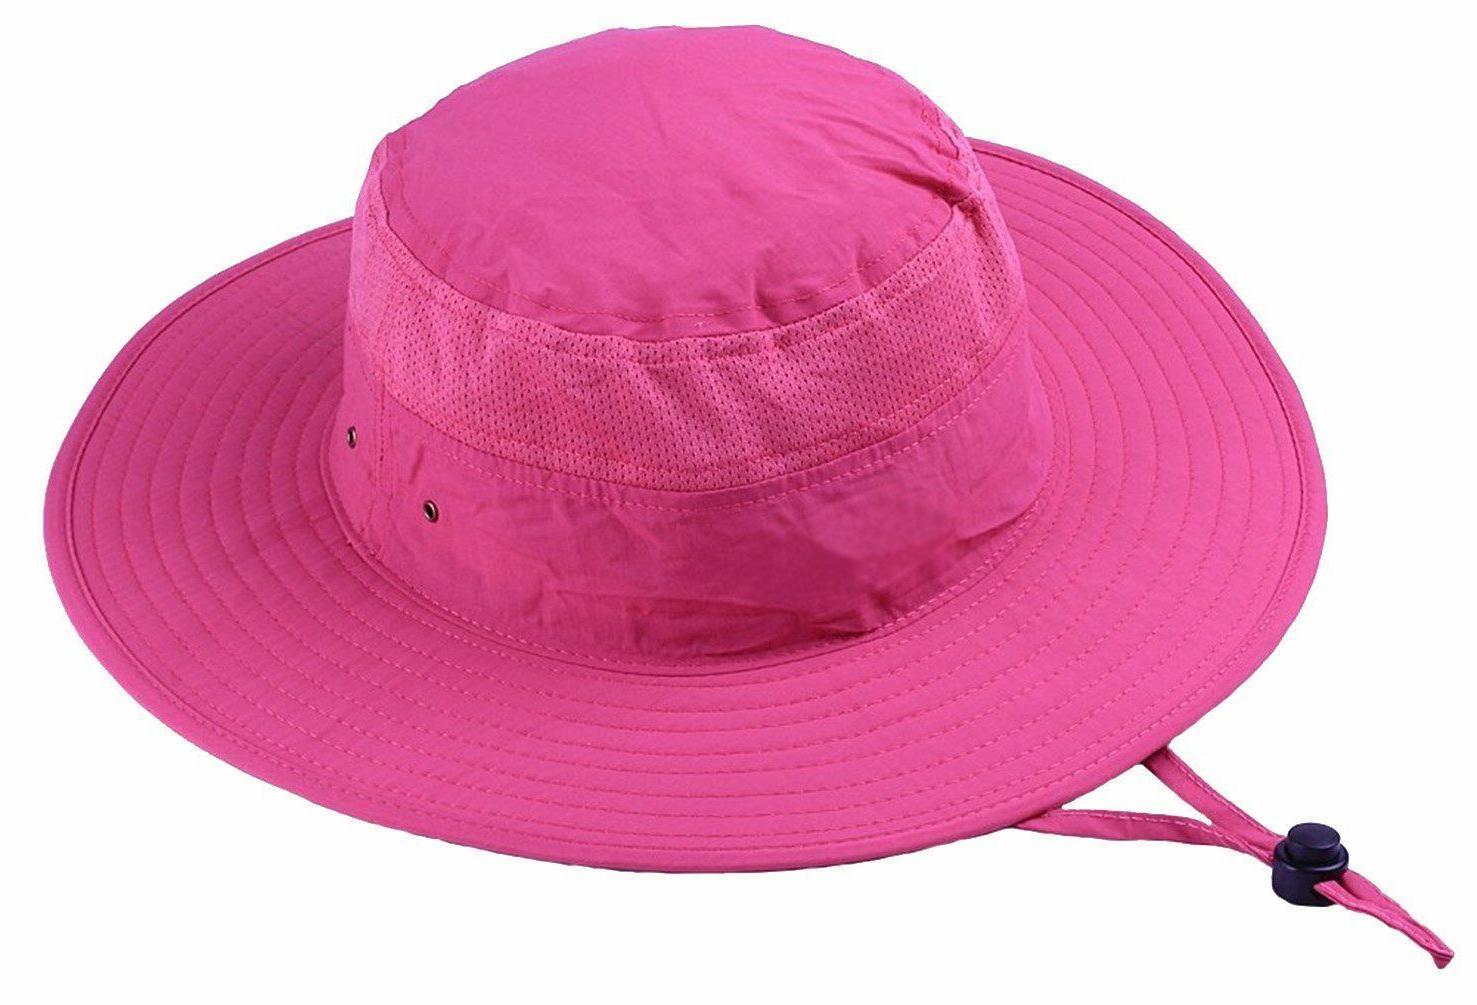 Camo Coll Cap Boonie Hat